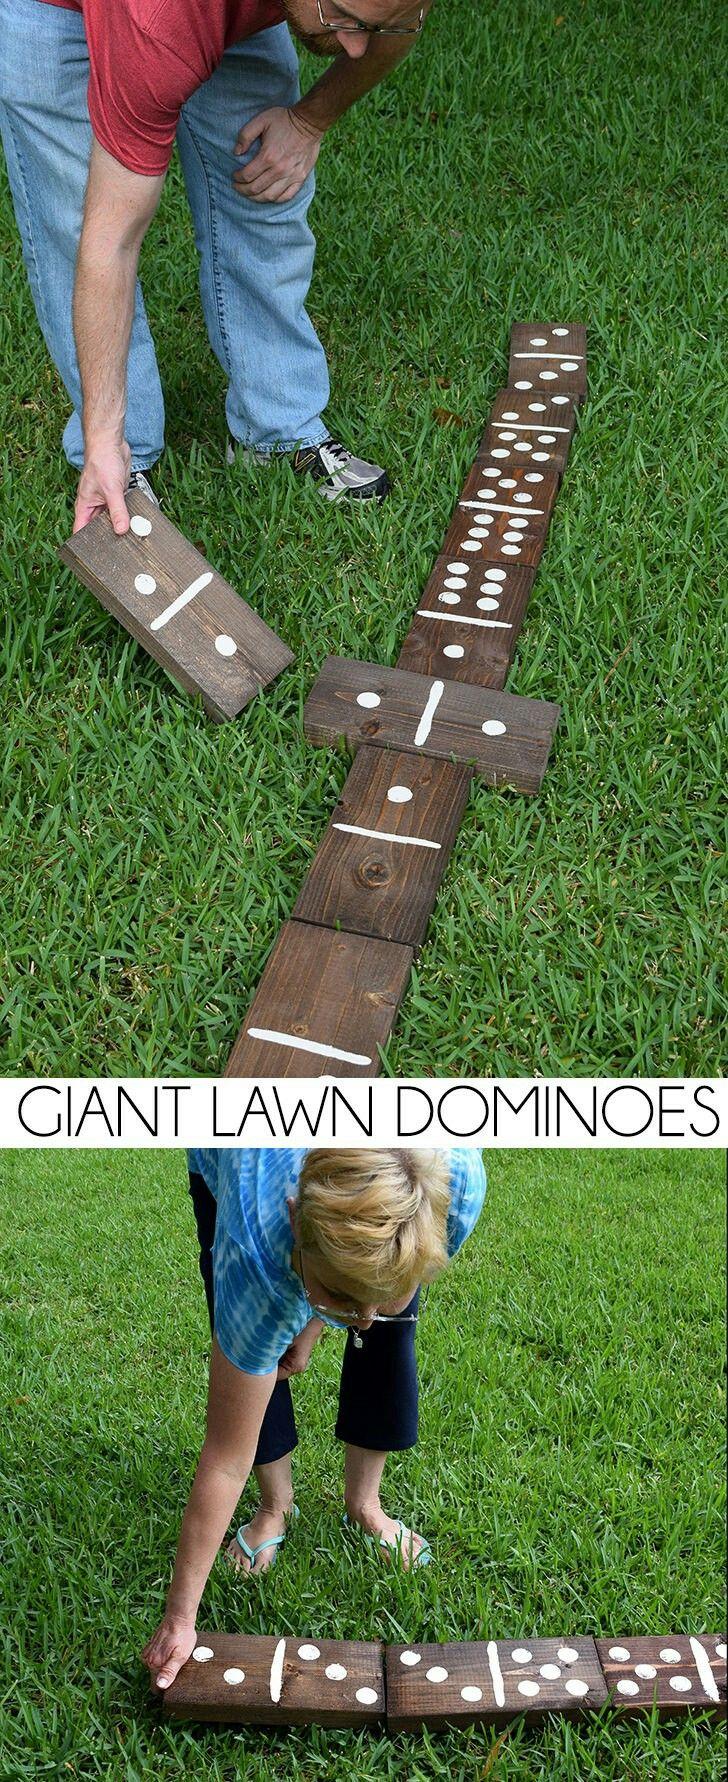 Dominos De Jardin Kreativ Spiele Im Garten Outdoor